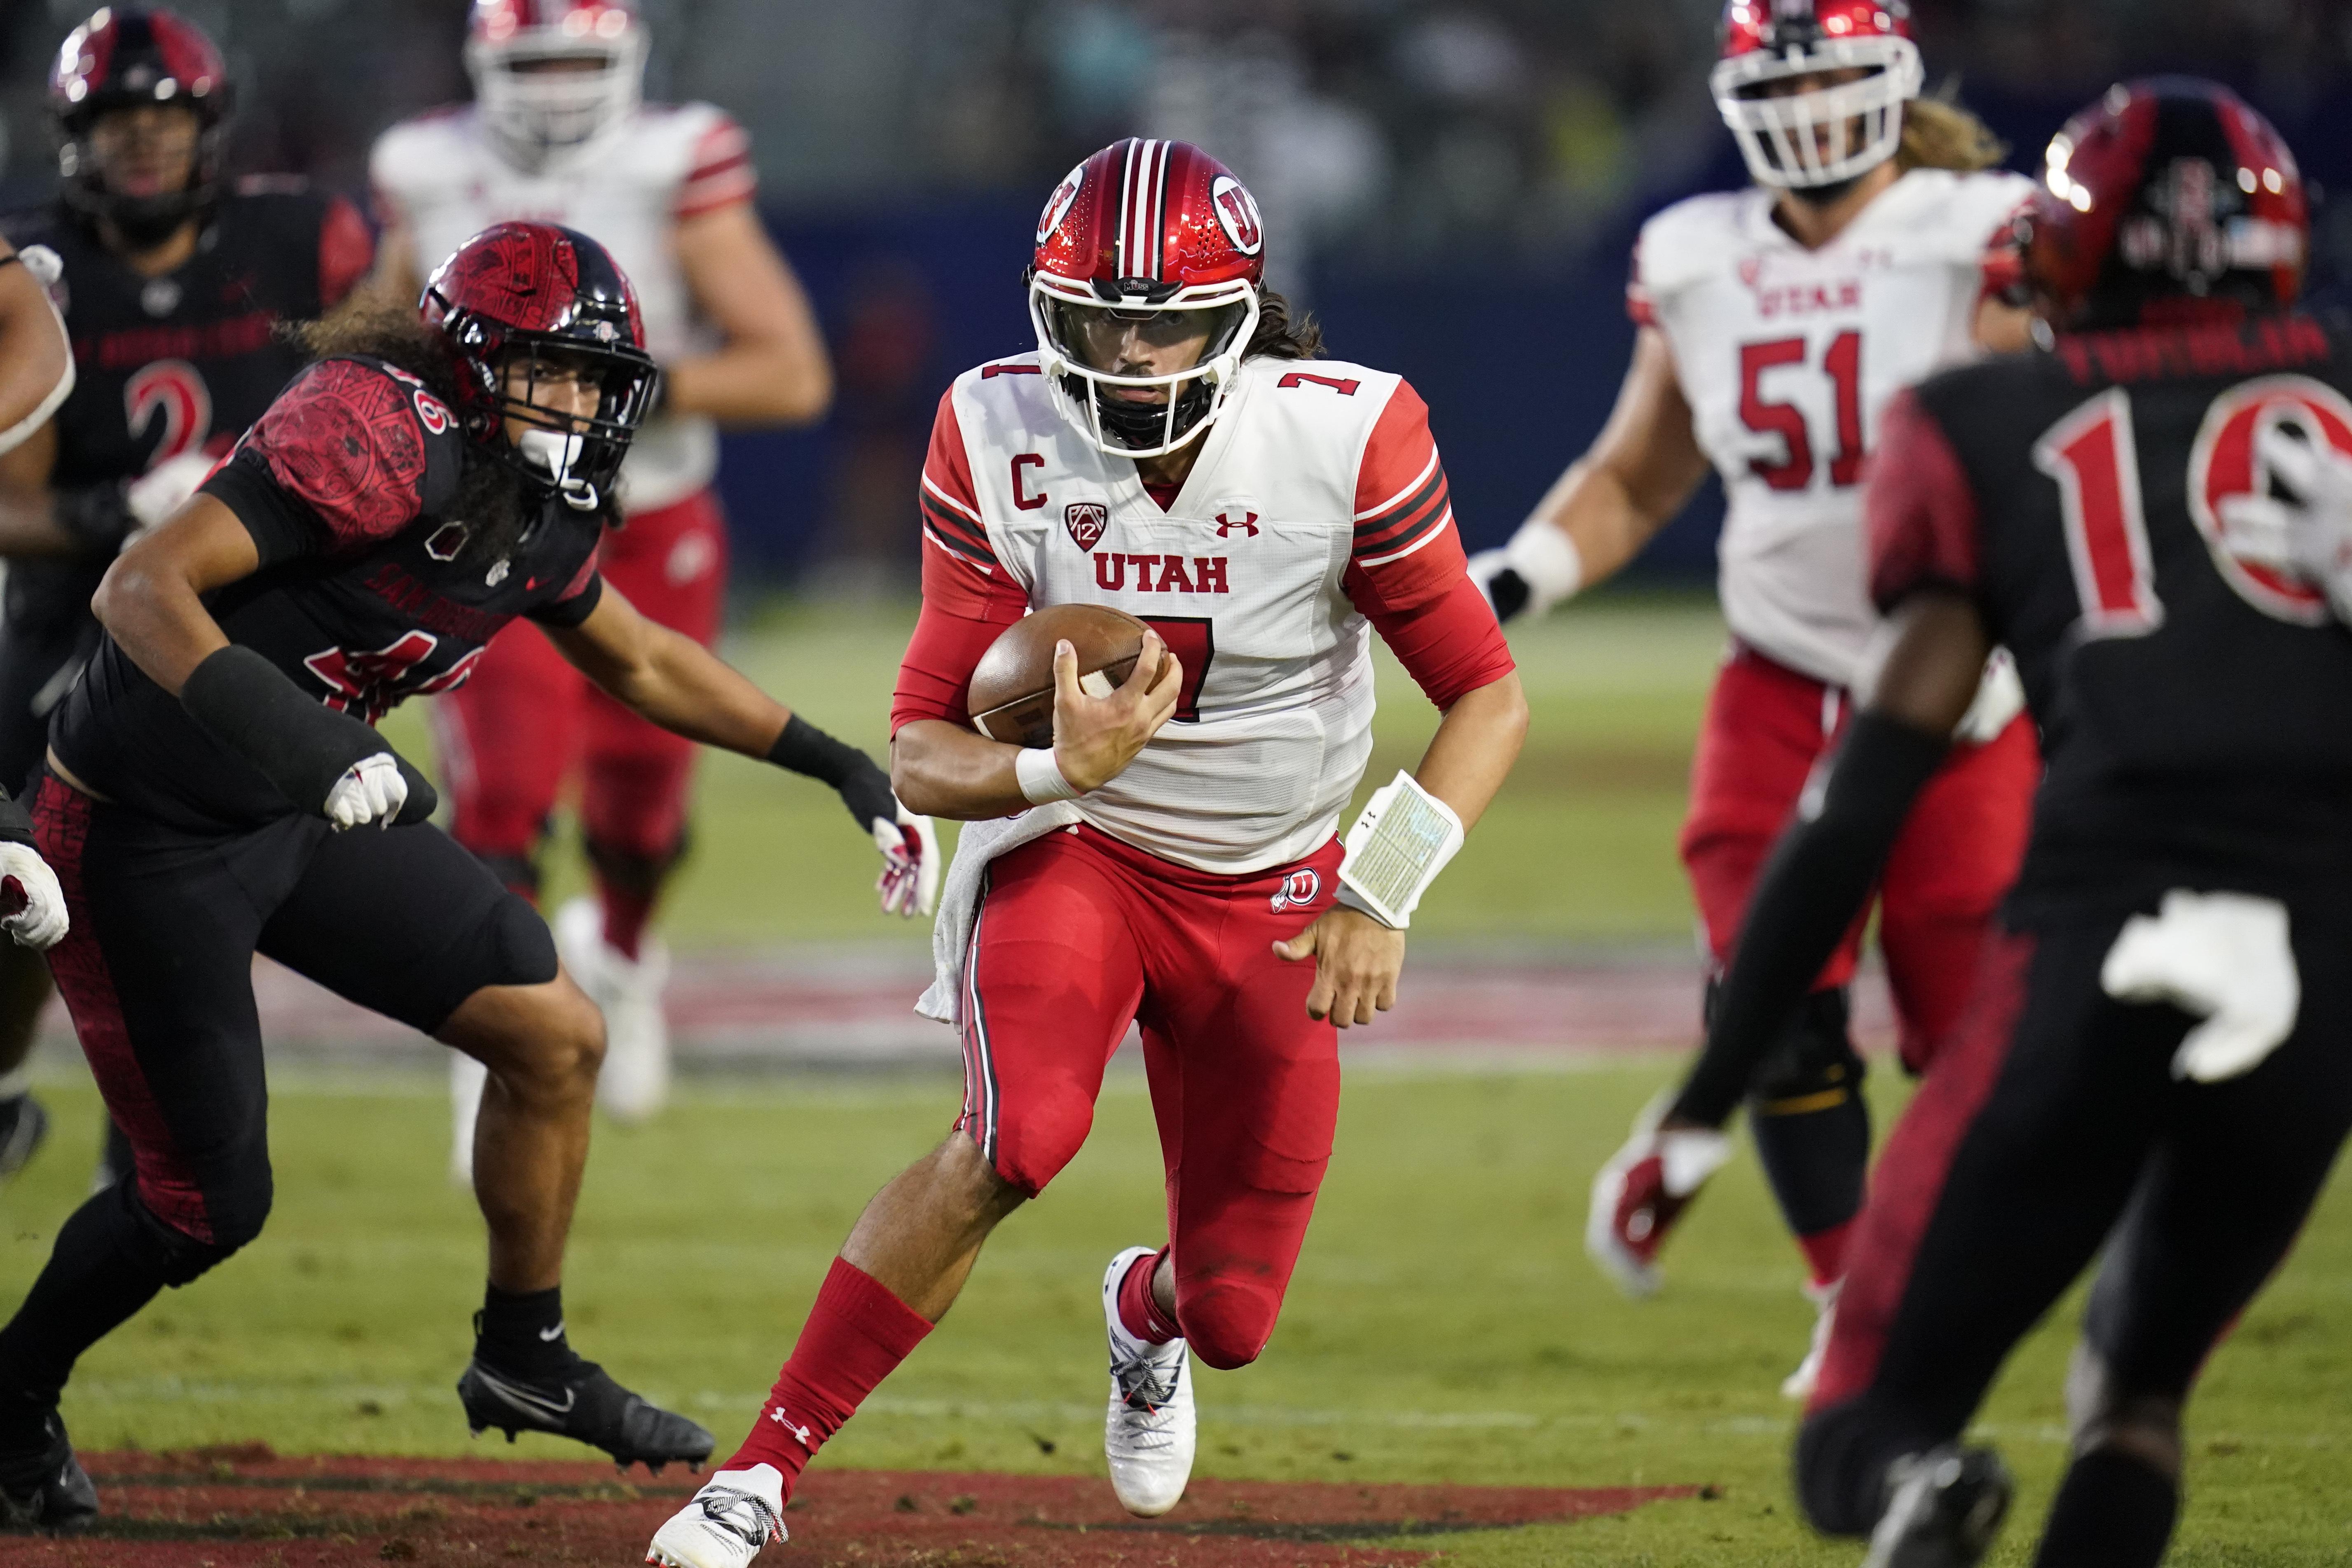 Utah quarterback Cameron Rising runs the ball during a game against San Diego State Saturday, Sept. 18, 2021, in Carson, Calif.